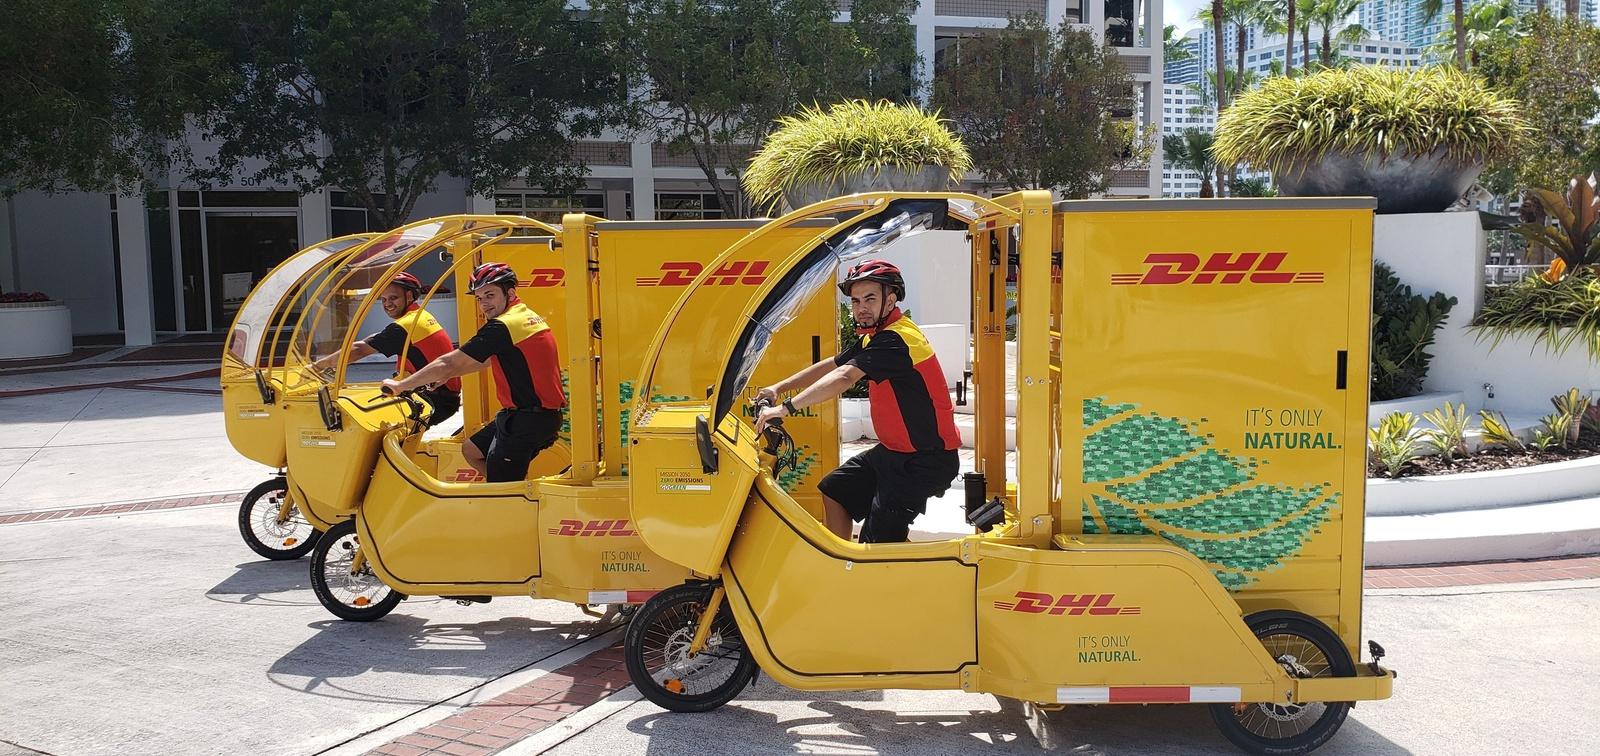 Miami pilots e-cargo bikes to reduce congestion, pollution